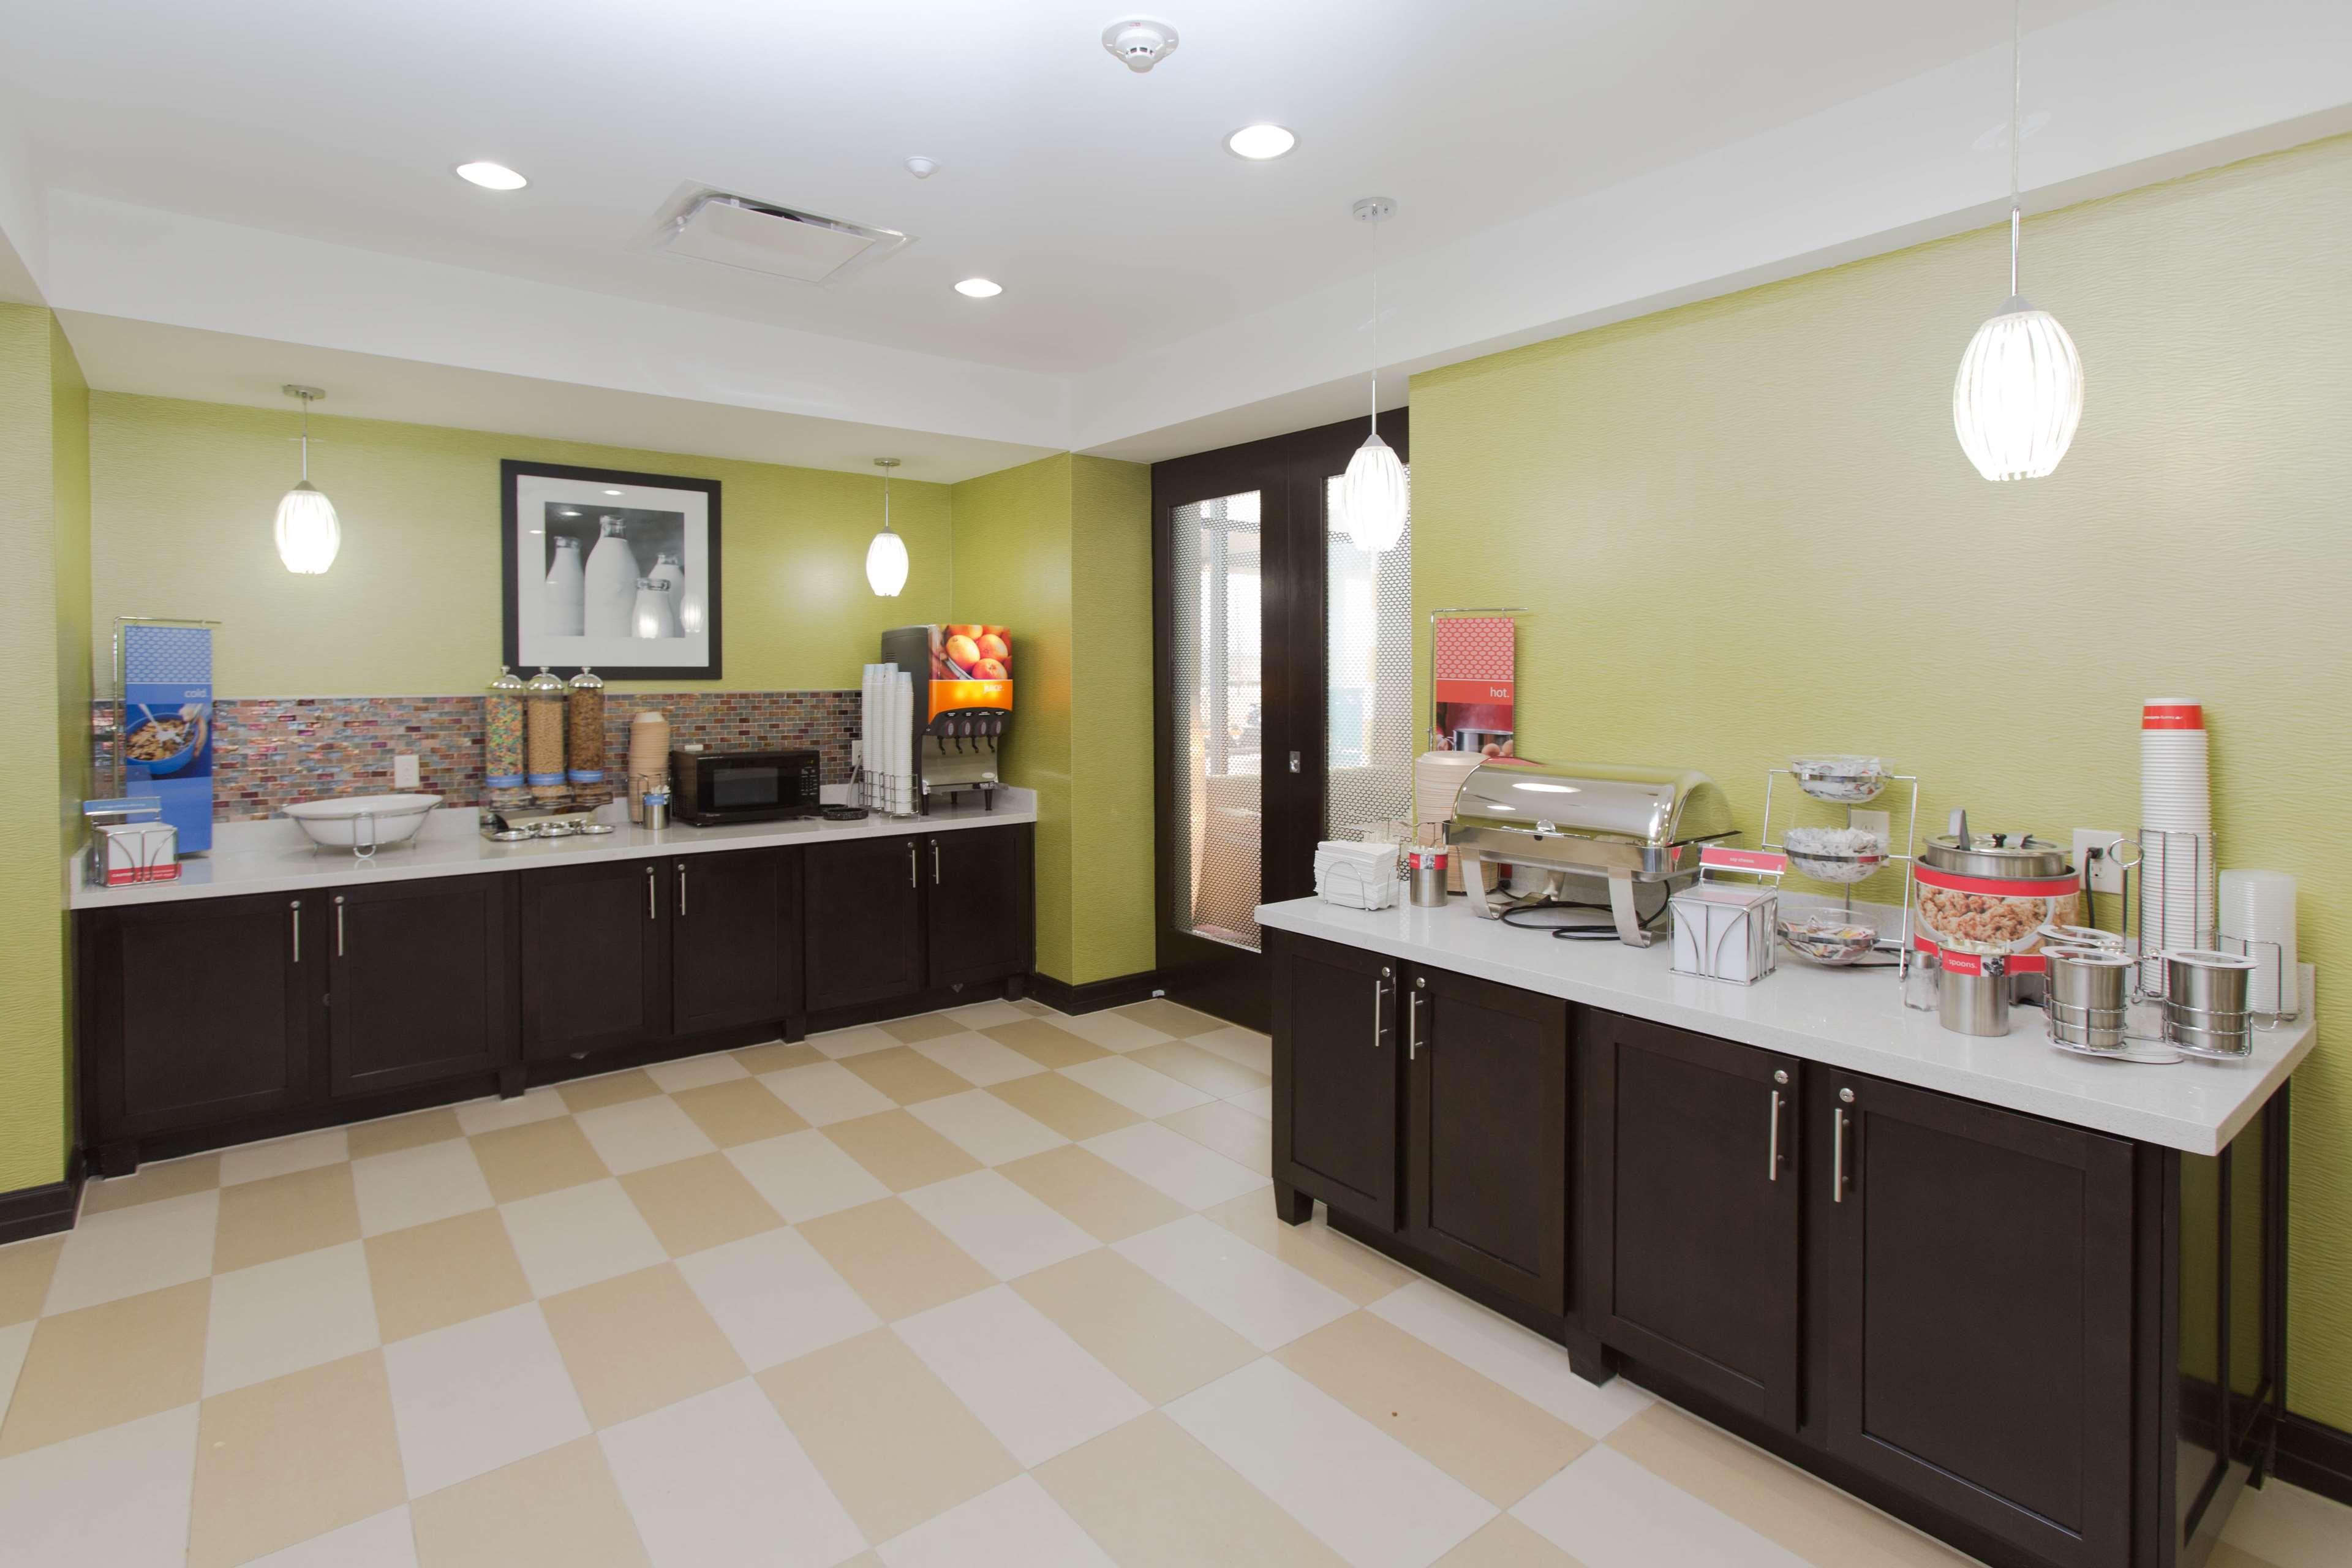 Hampton Inn & Suites Missouri City, TX image 18